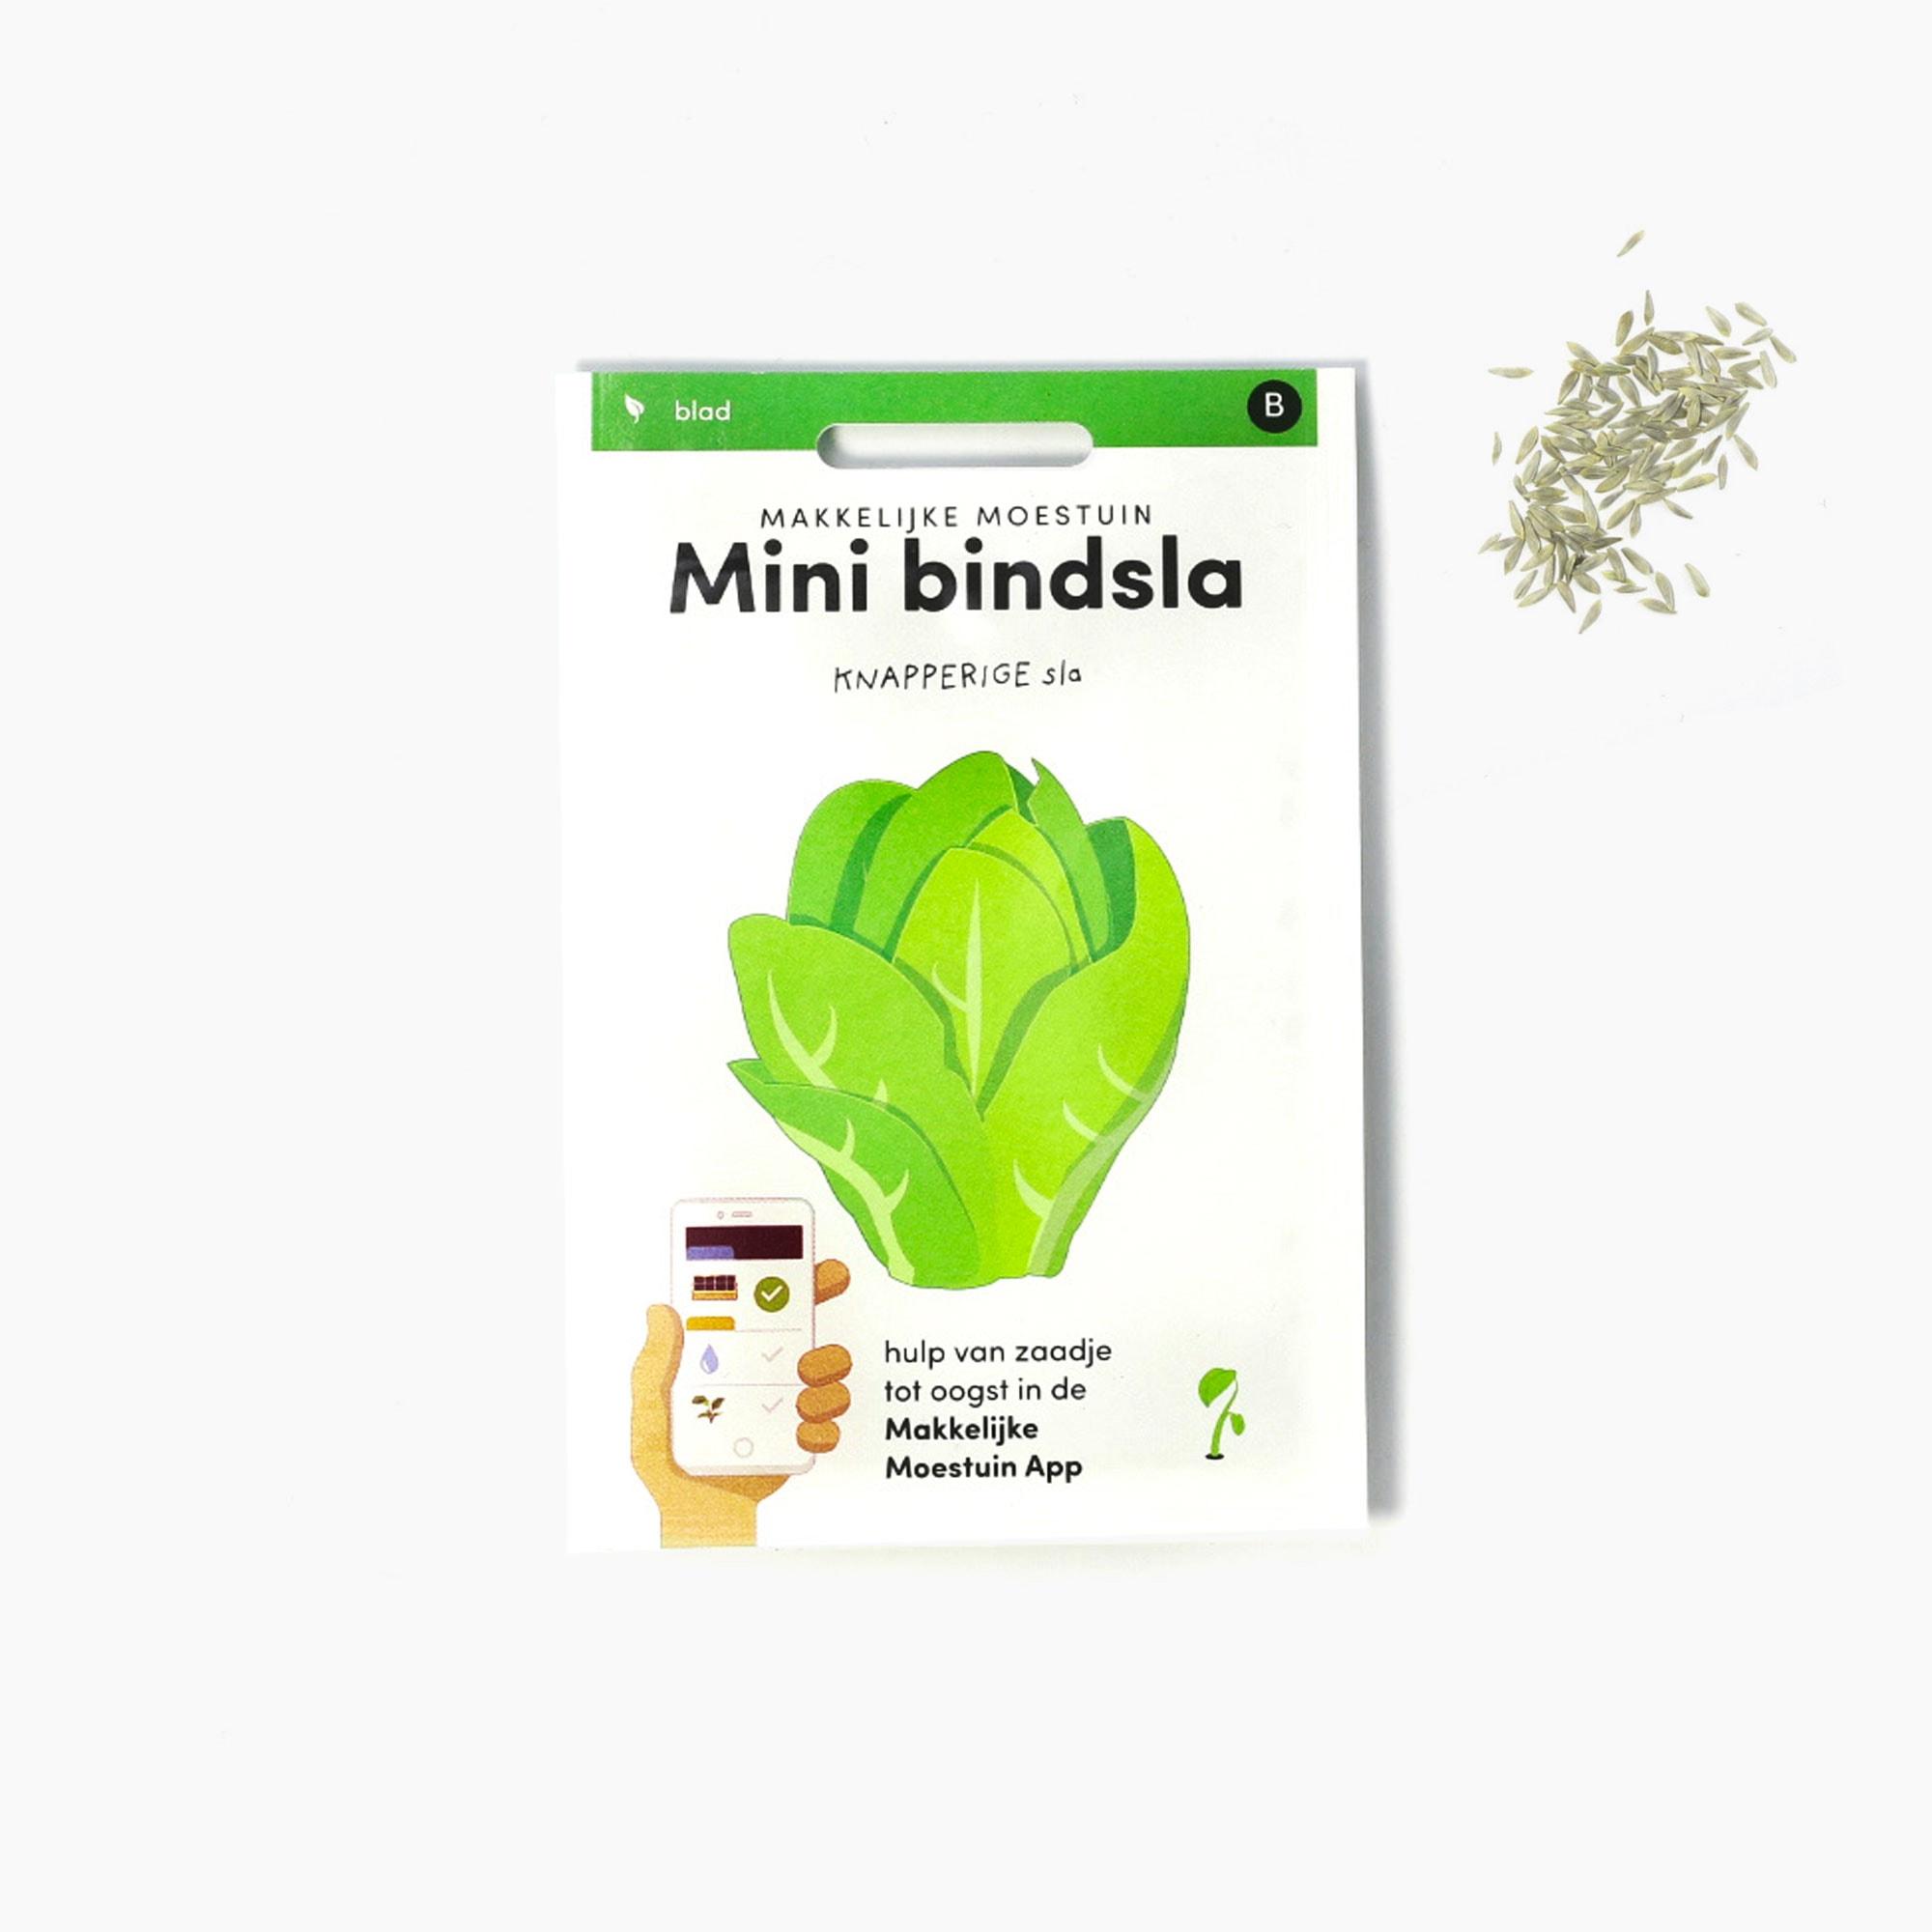 Bindsla-(1).jpg